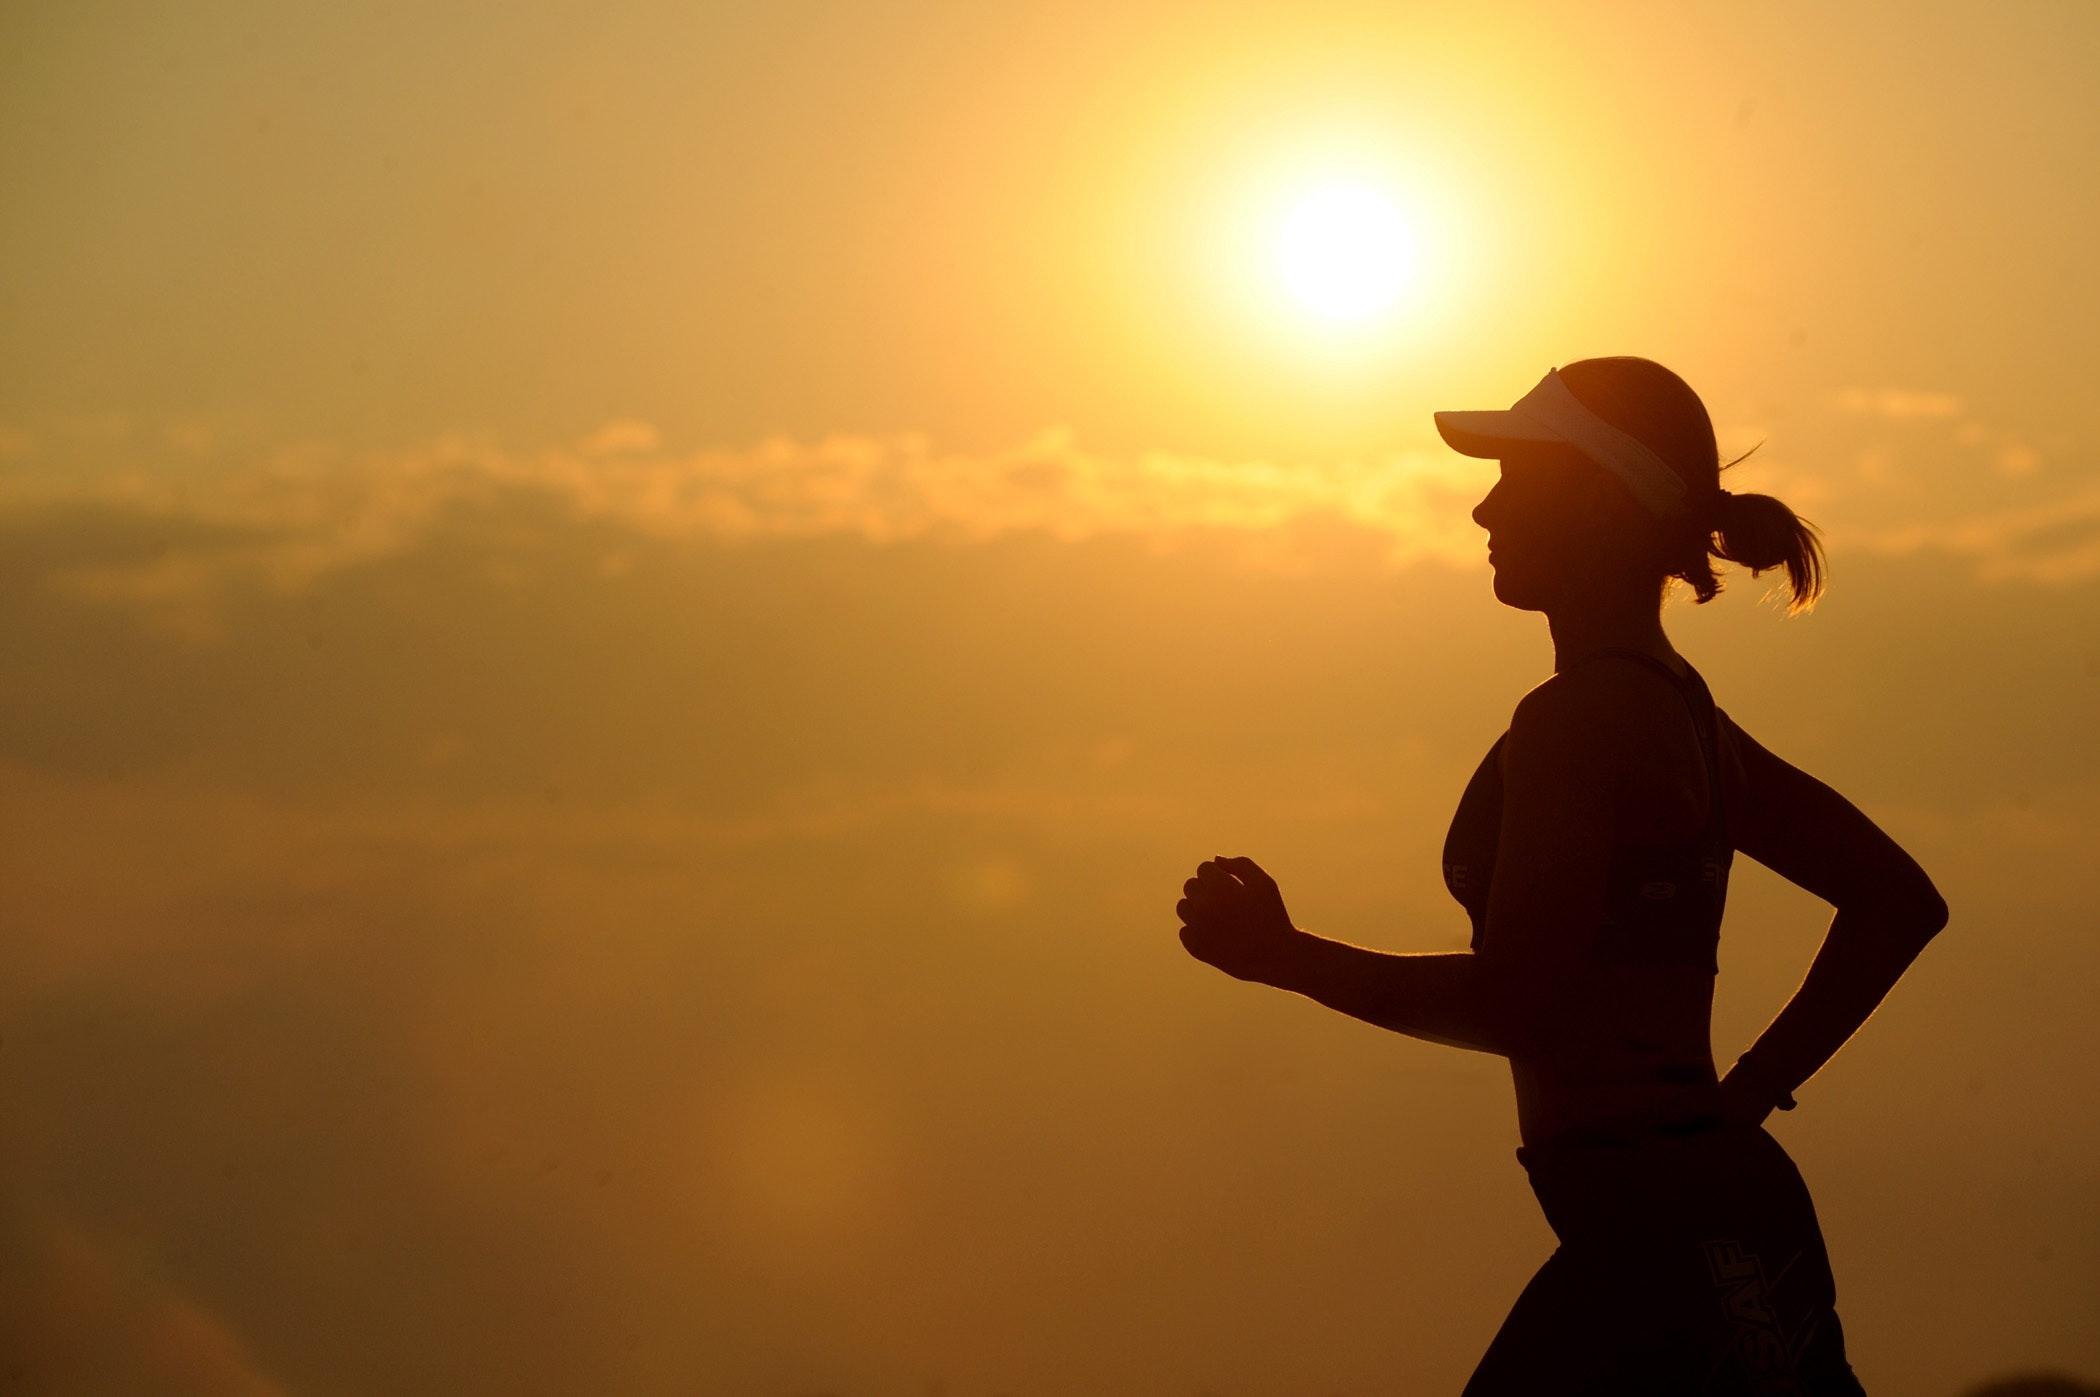 Excessive exercise: aspiring athlete or eating disorder symptom?